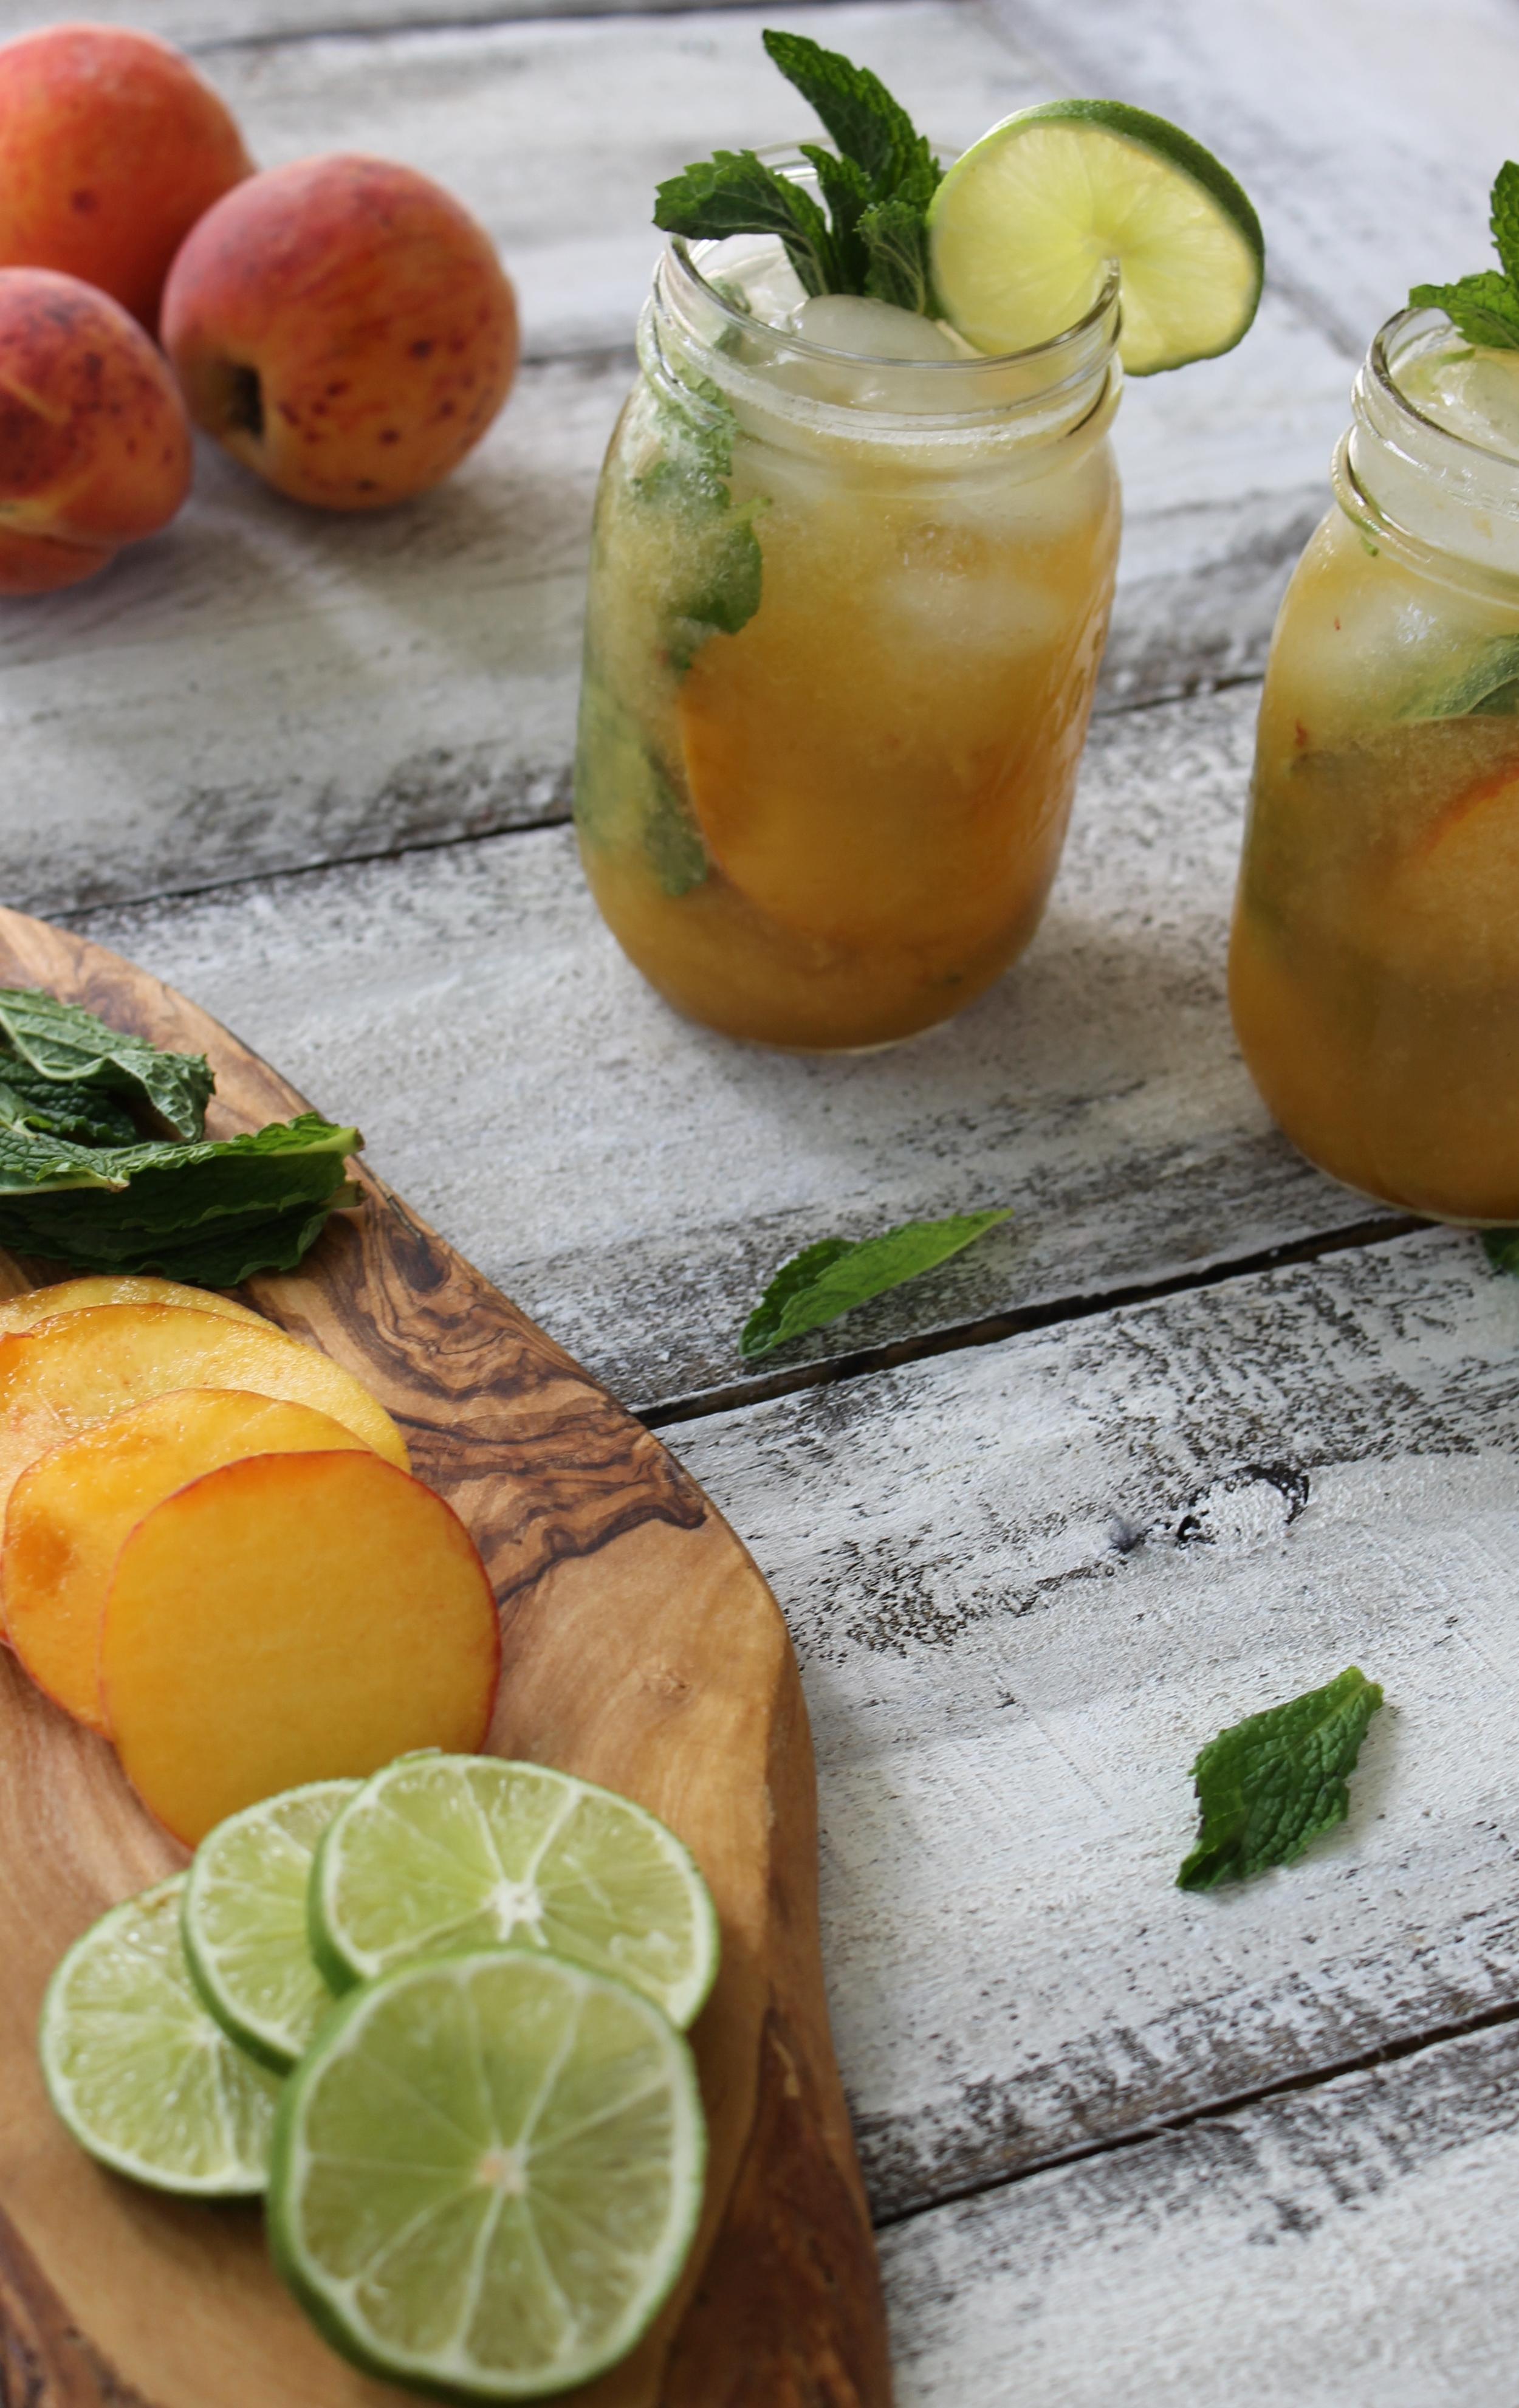 louisiana peach mojito.jpg